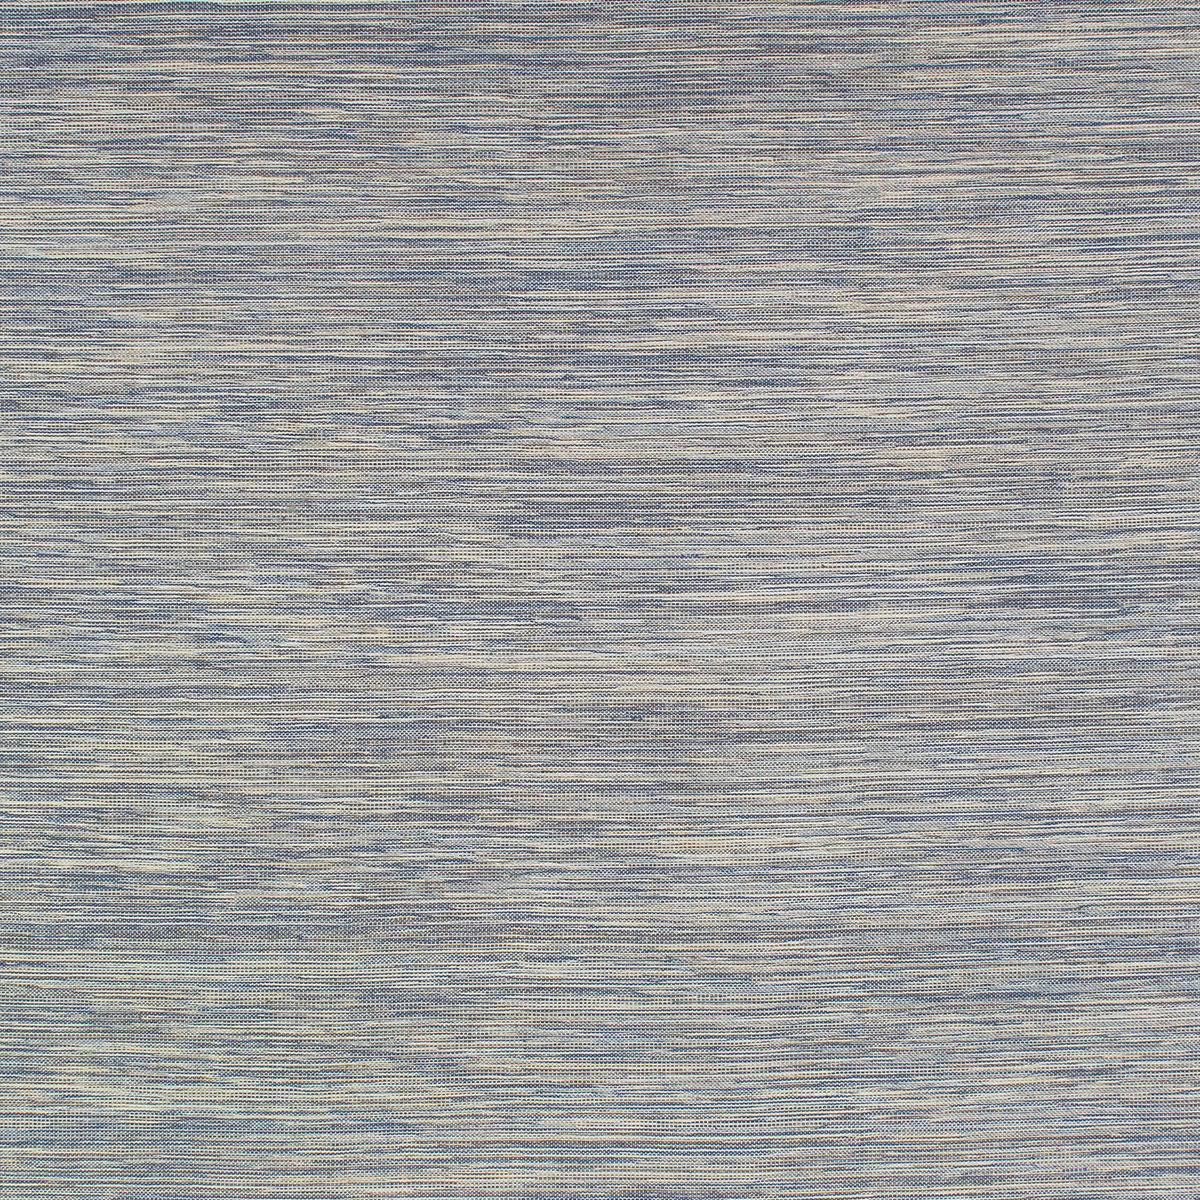 ewan_wool-cotton-tencel_broadloom_patterson-flynn-martin_pfm